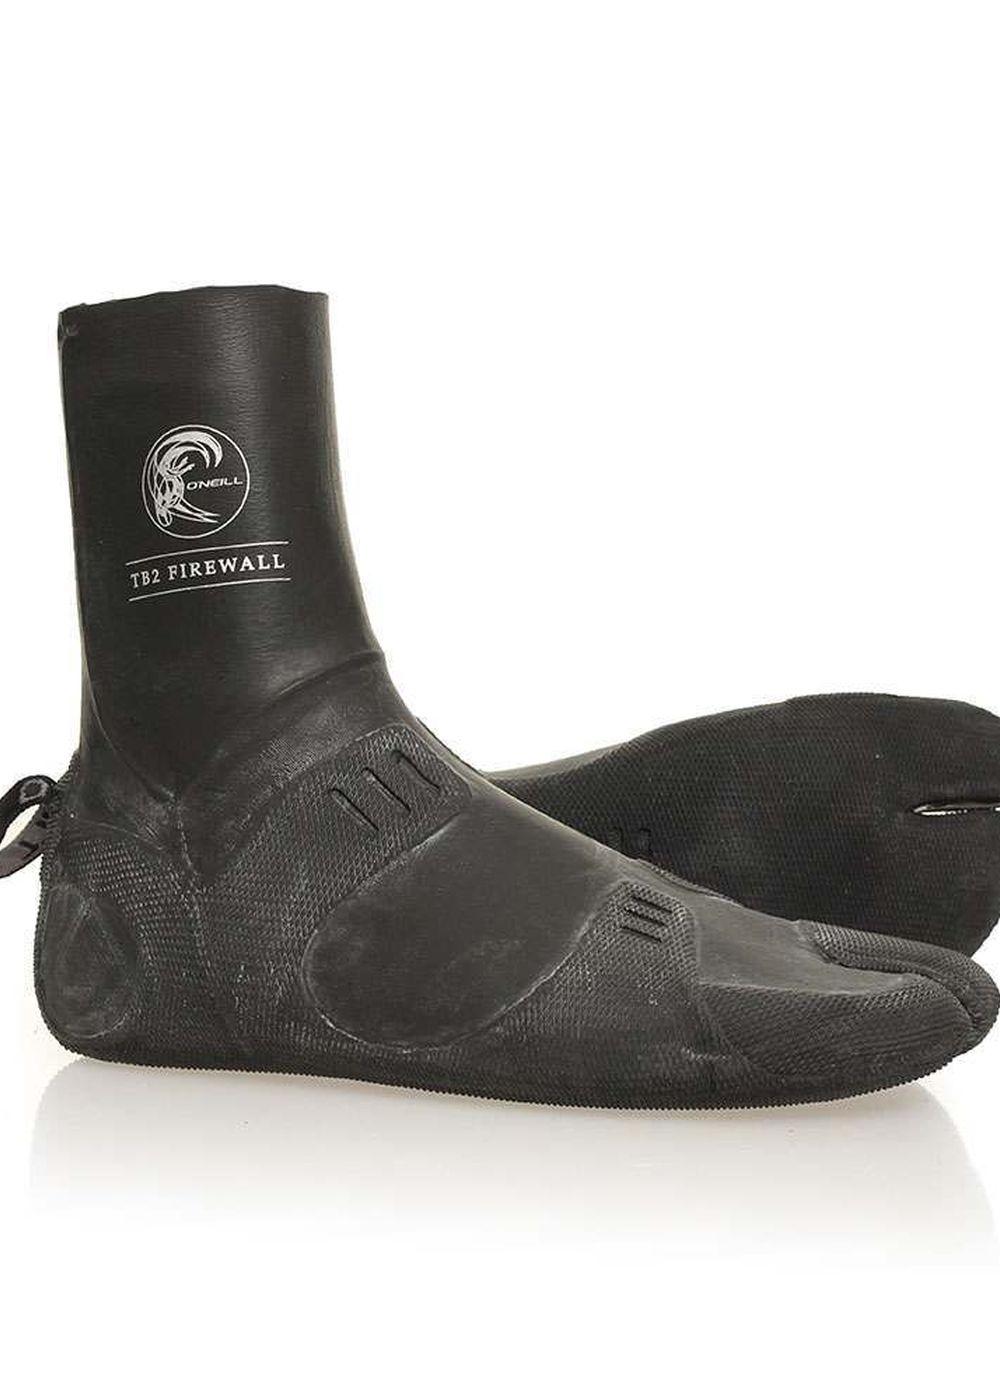 Oneill Originals 3mm Split Toe Wetsuit Boots Picture